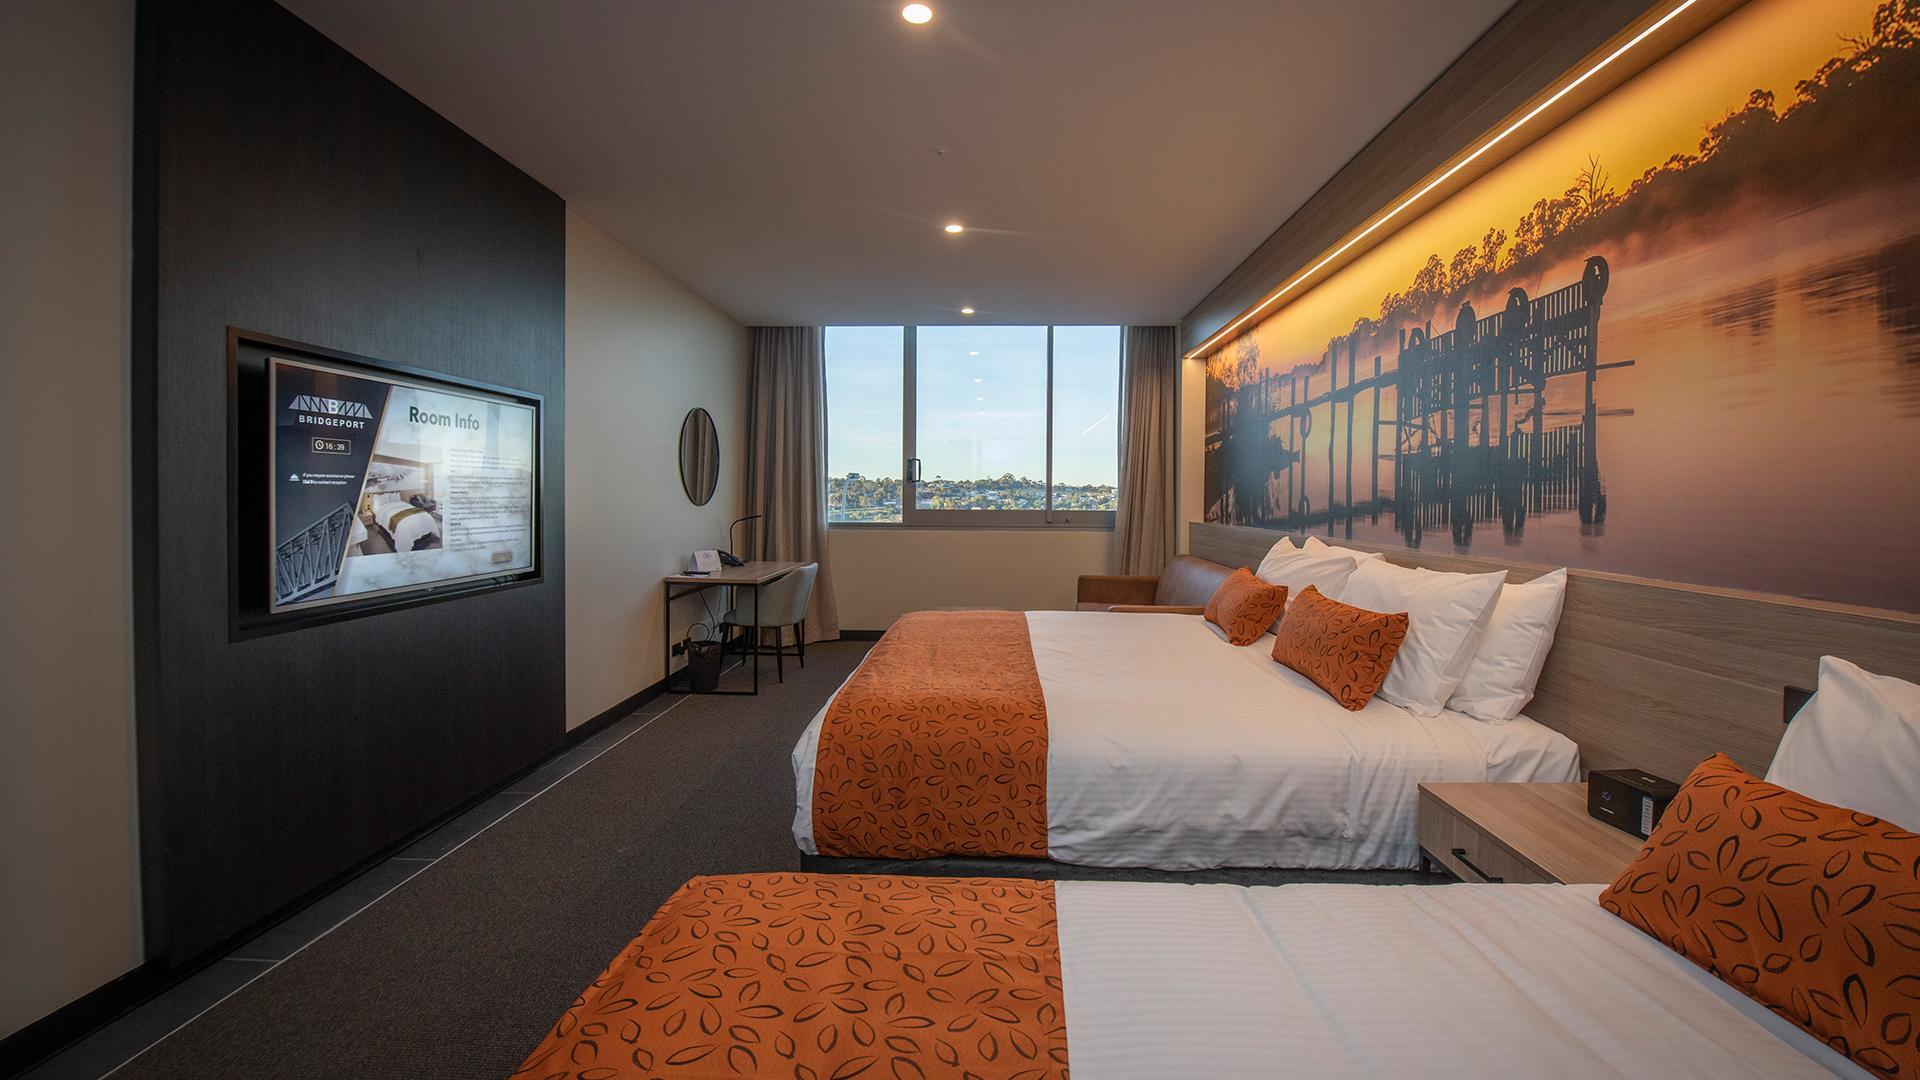 Riverside Suite image 1 at Bridgeport Hotel by The Rural City of Murray Bridge, South Australia, Australia